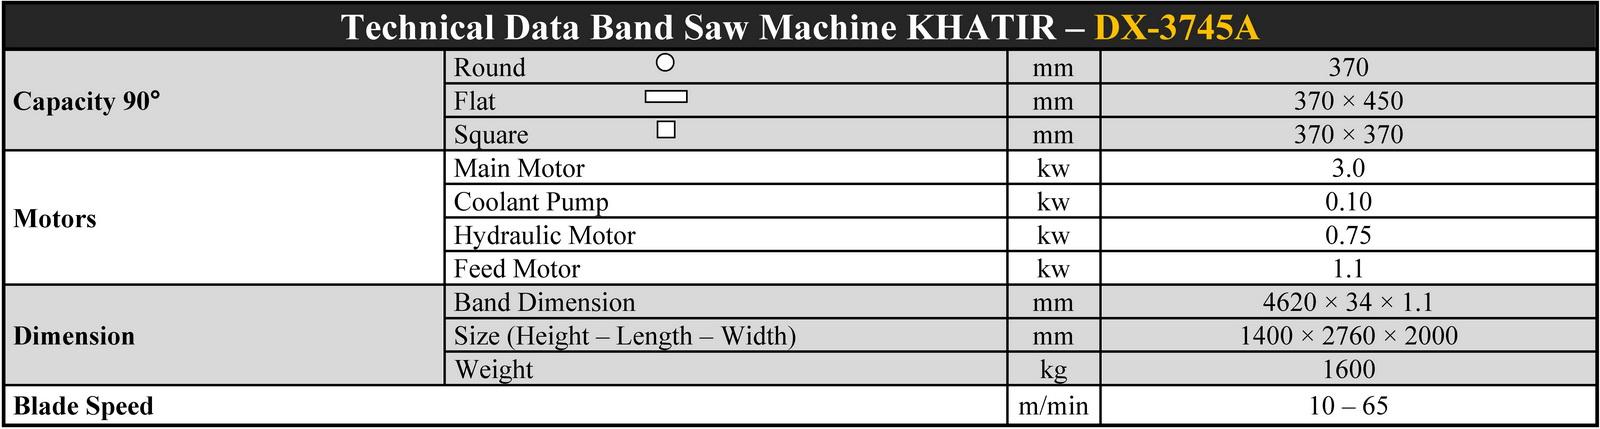 DX 3745A - مشخصات فنی دستگاه اره نواری دو ستون اتوماتیک خطیر